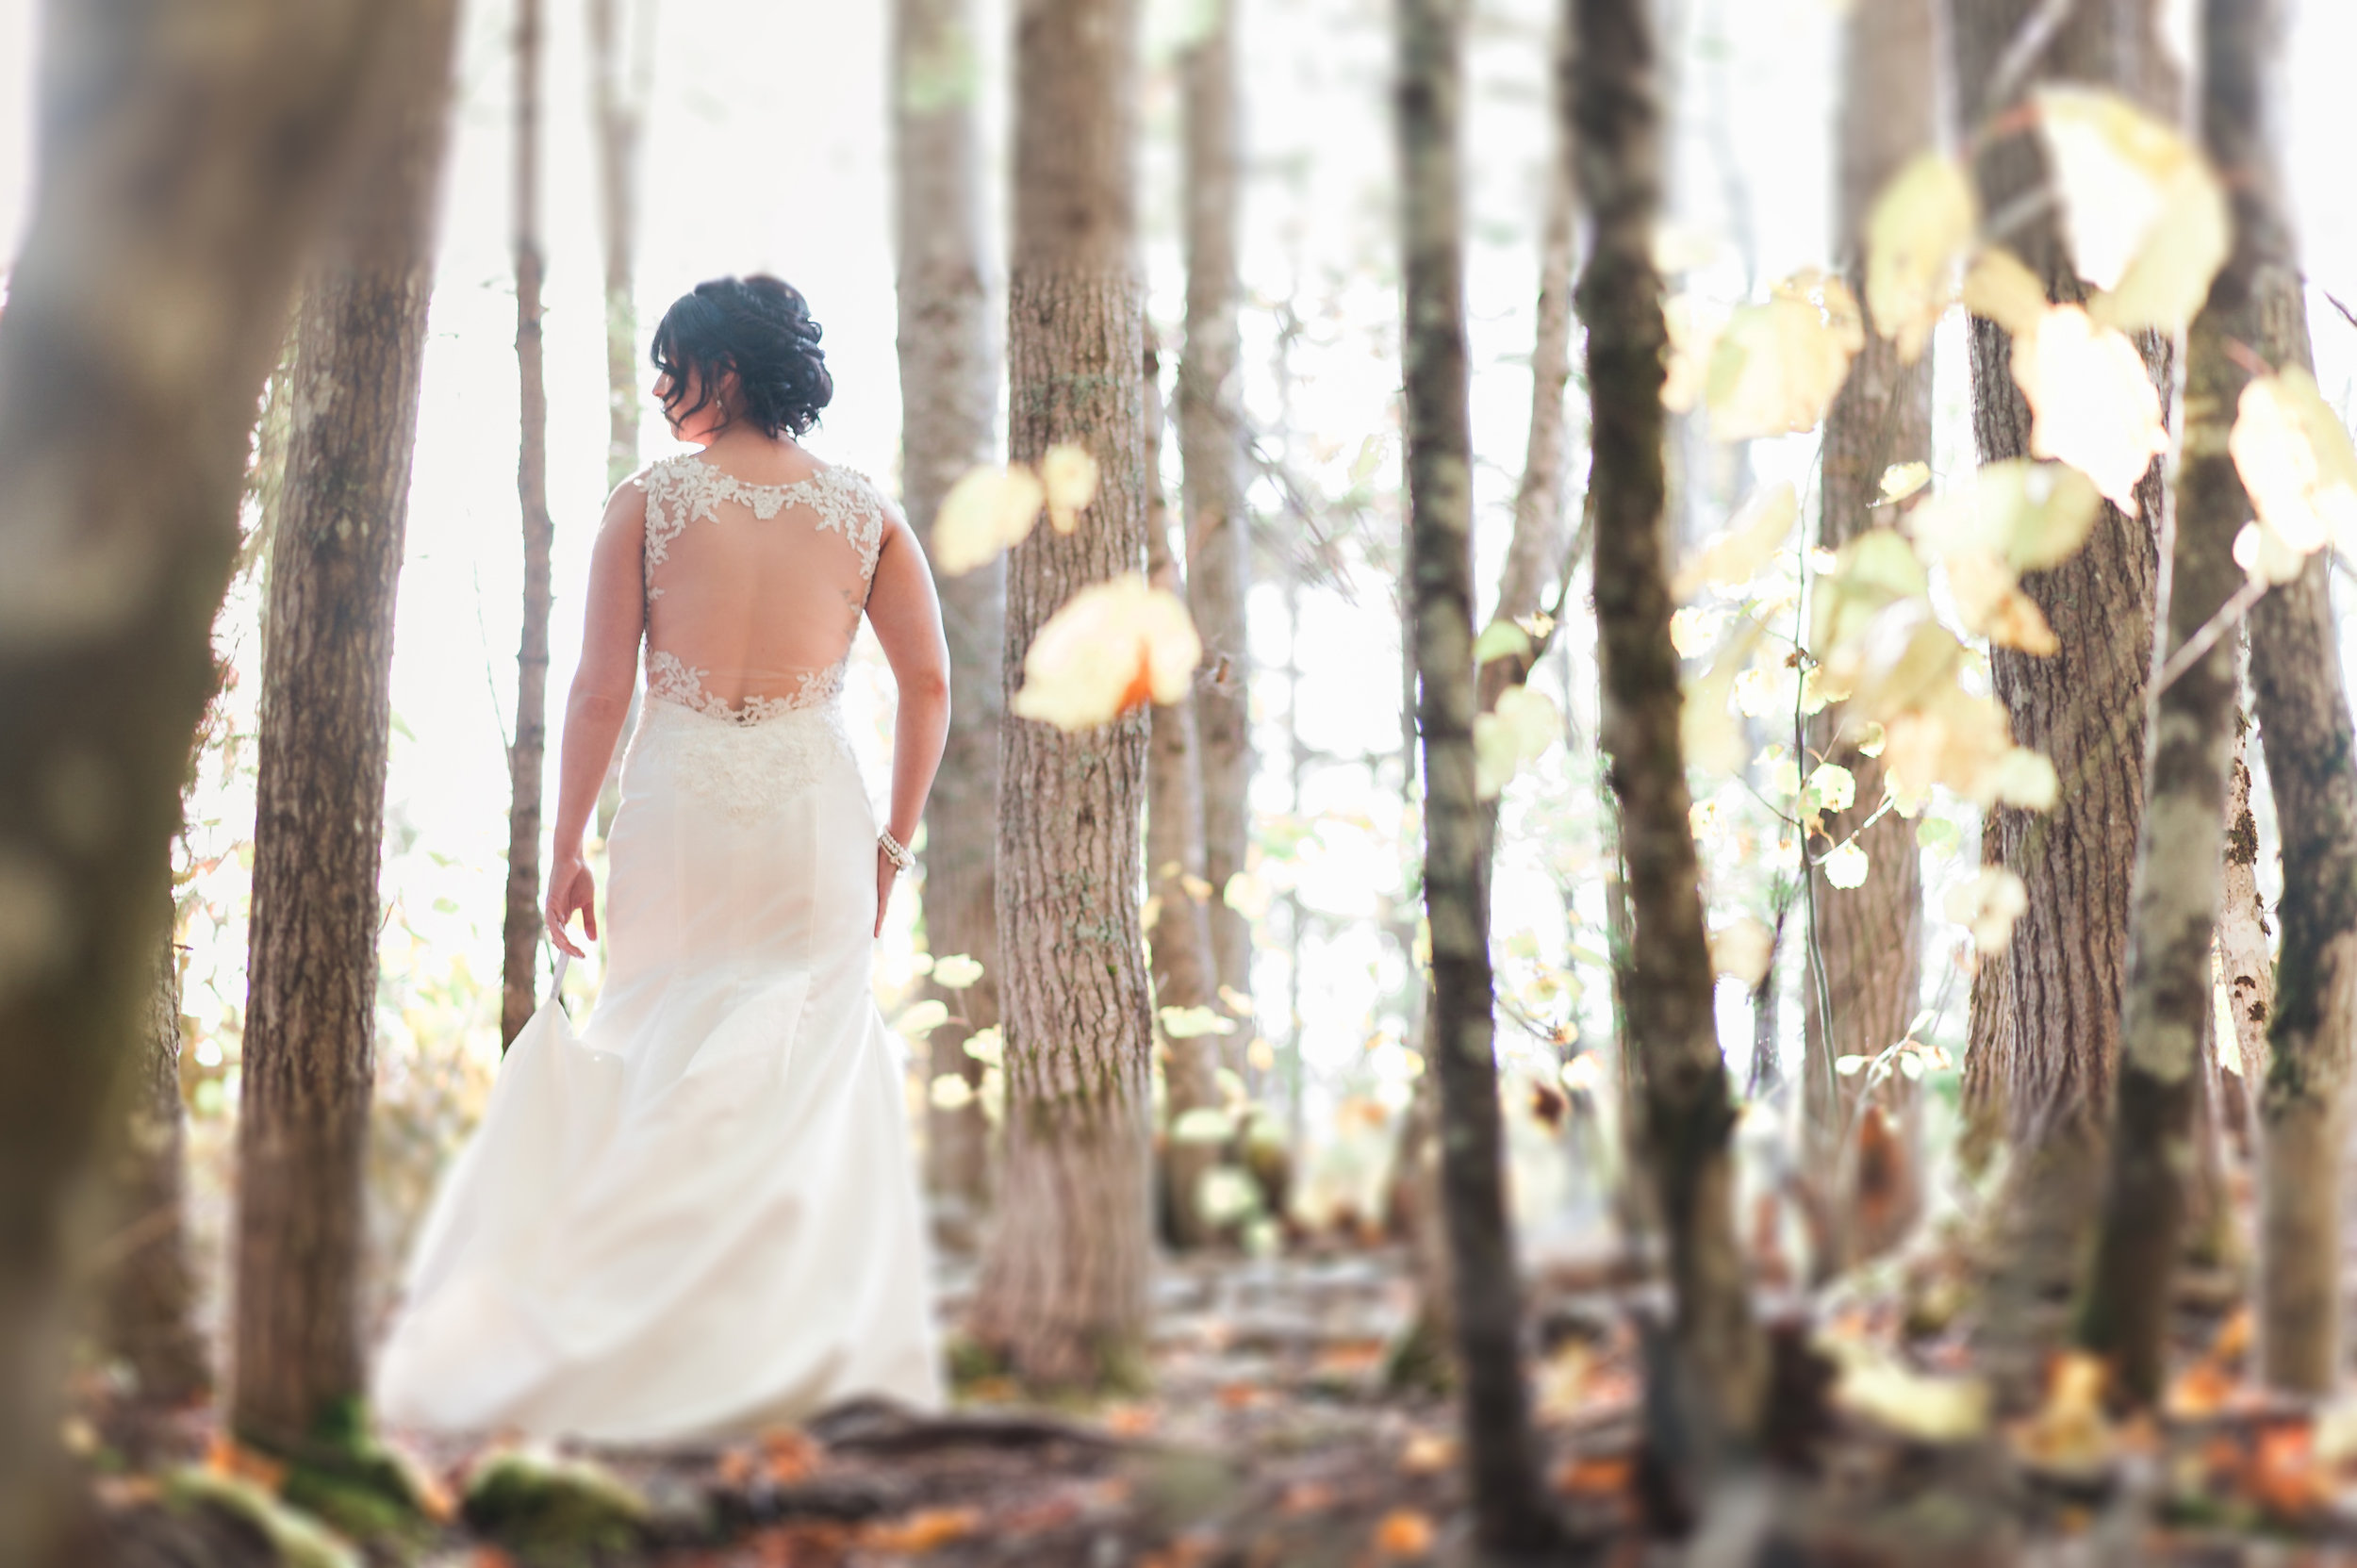 whimsical bride shot